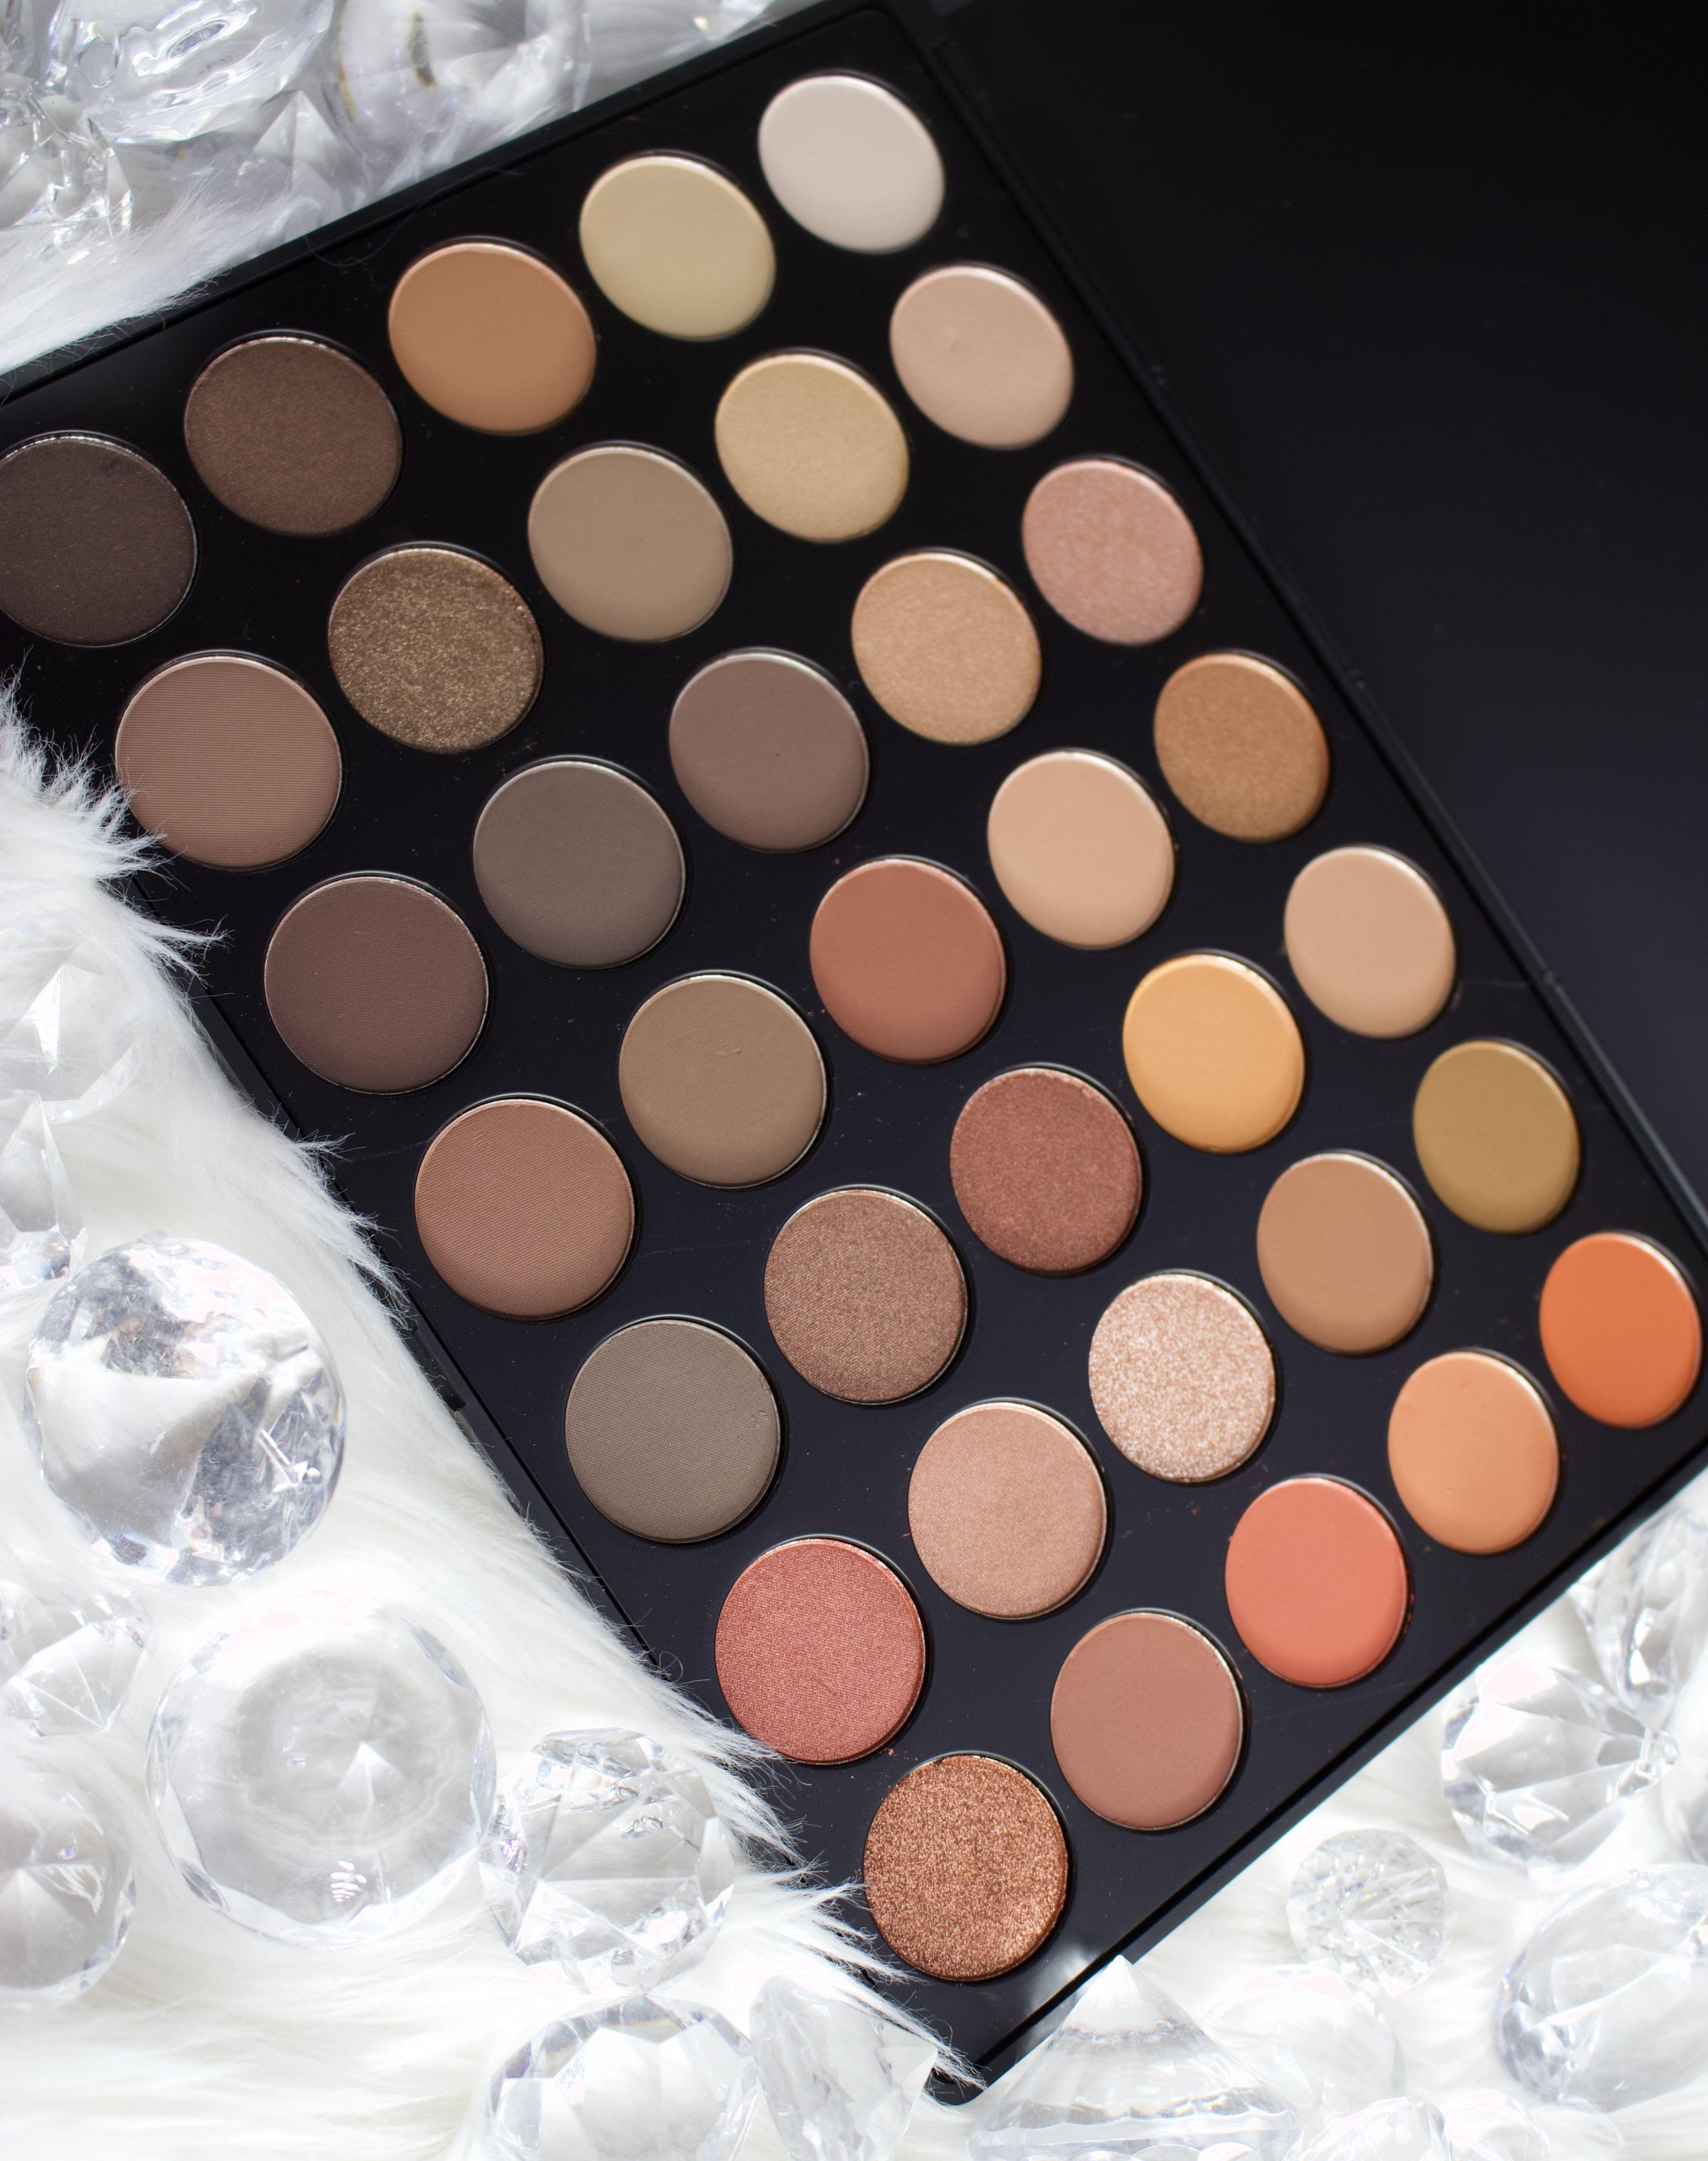 Morphe 35O palette, warm neutral eyeshadow, Morphe Brushes